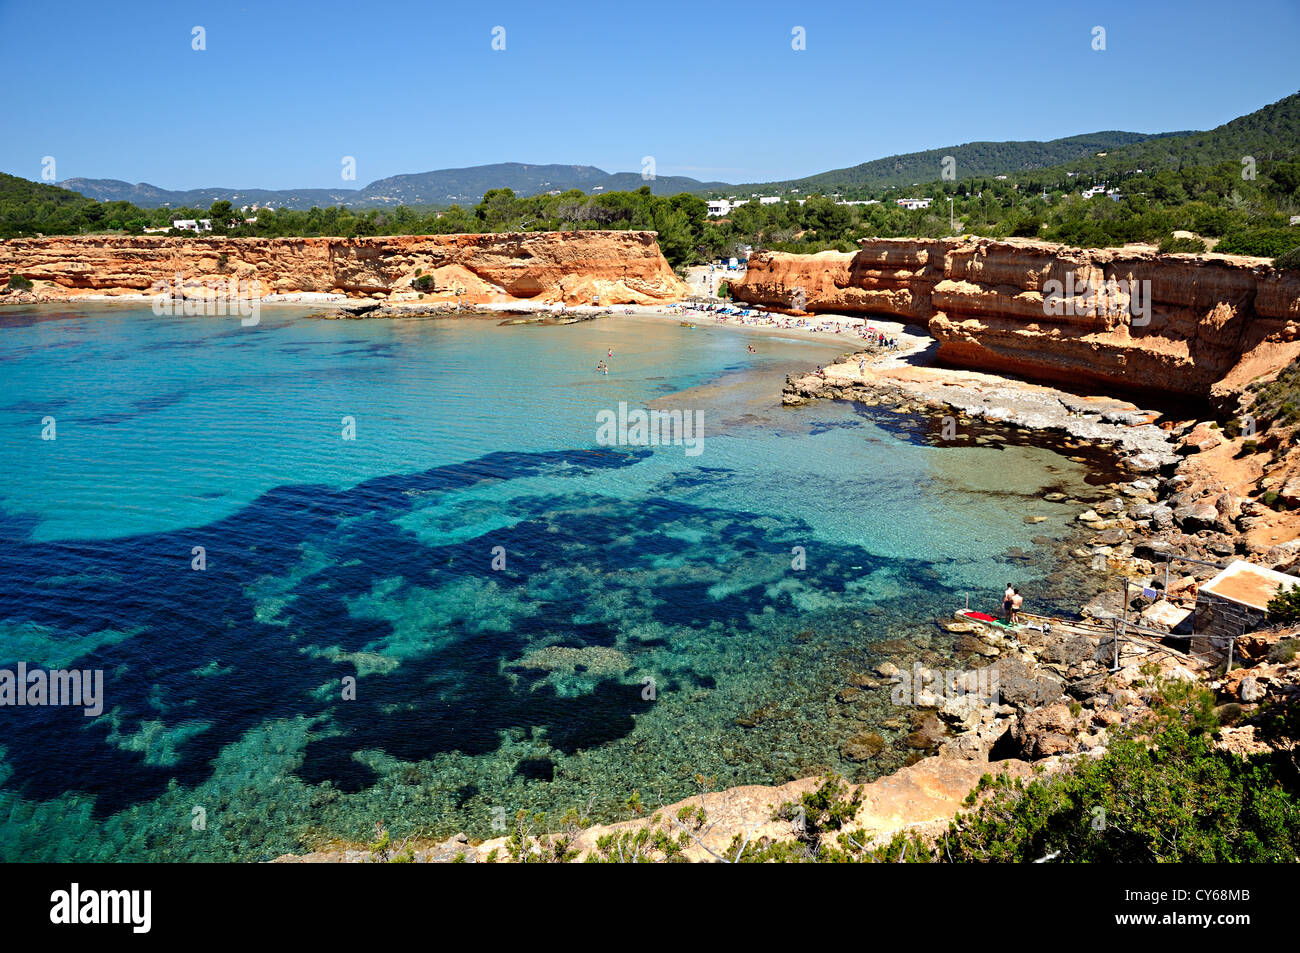 Sa Caleta beach . Ibiza, Balearic Islands, Spain - Stock Image